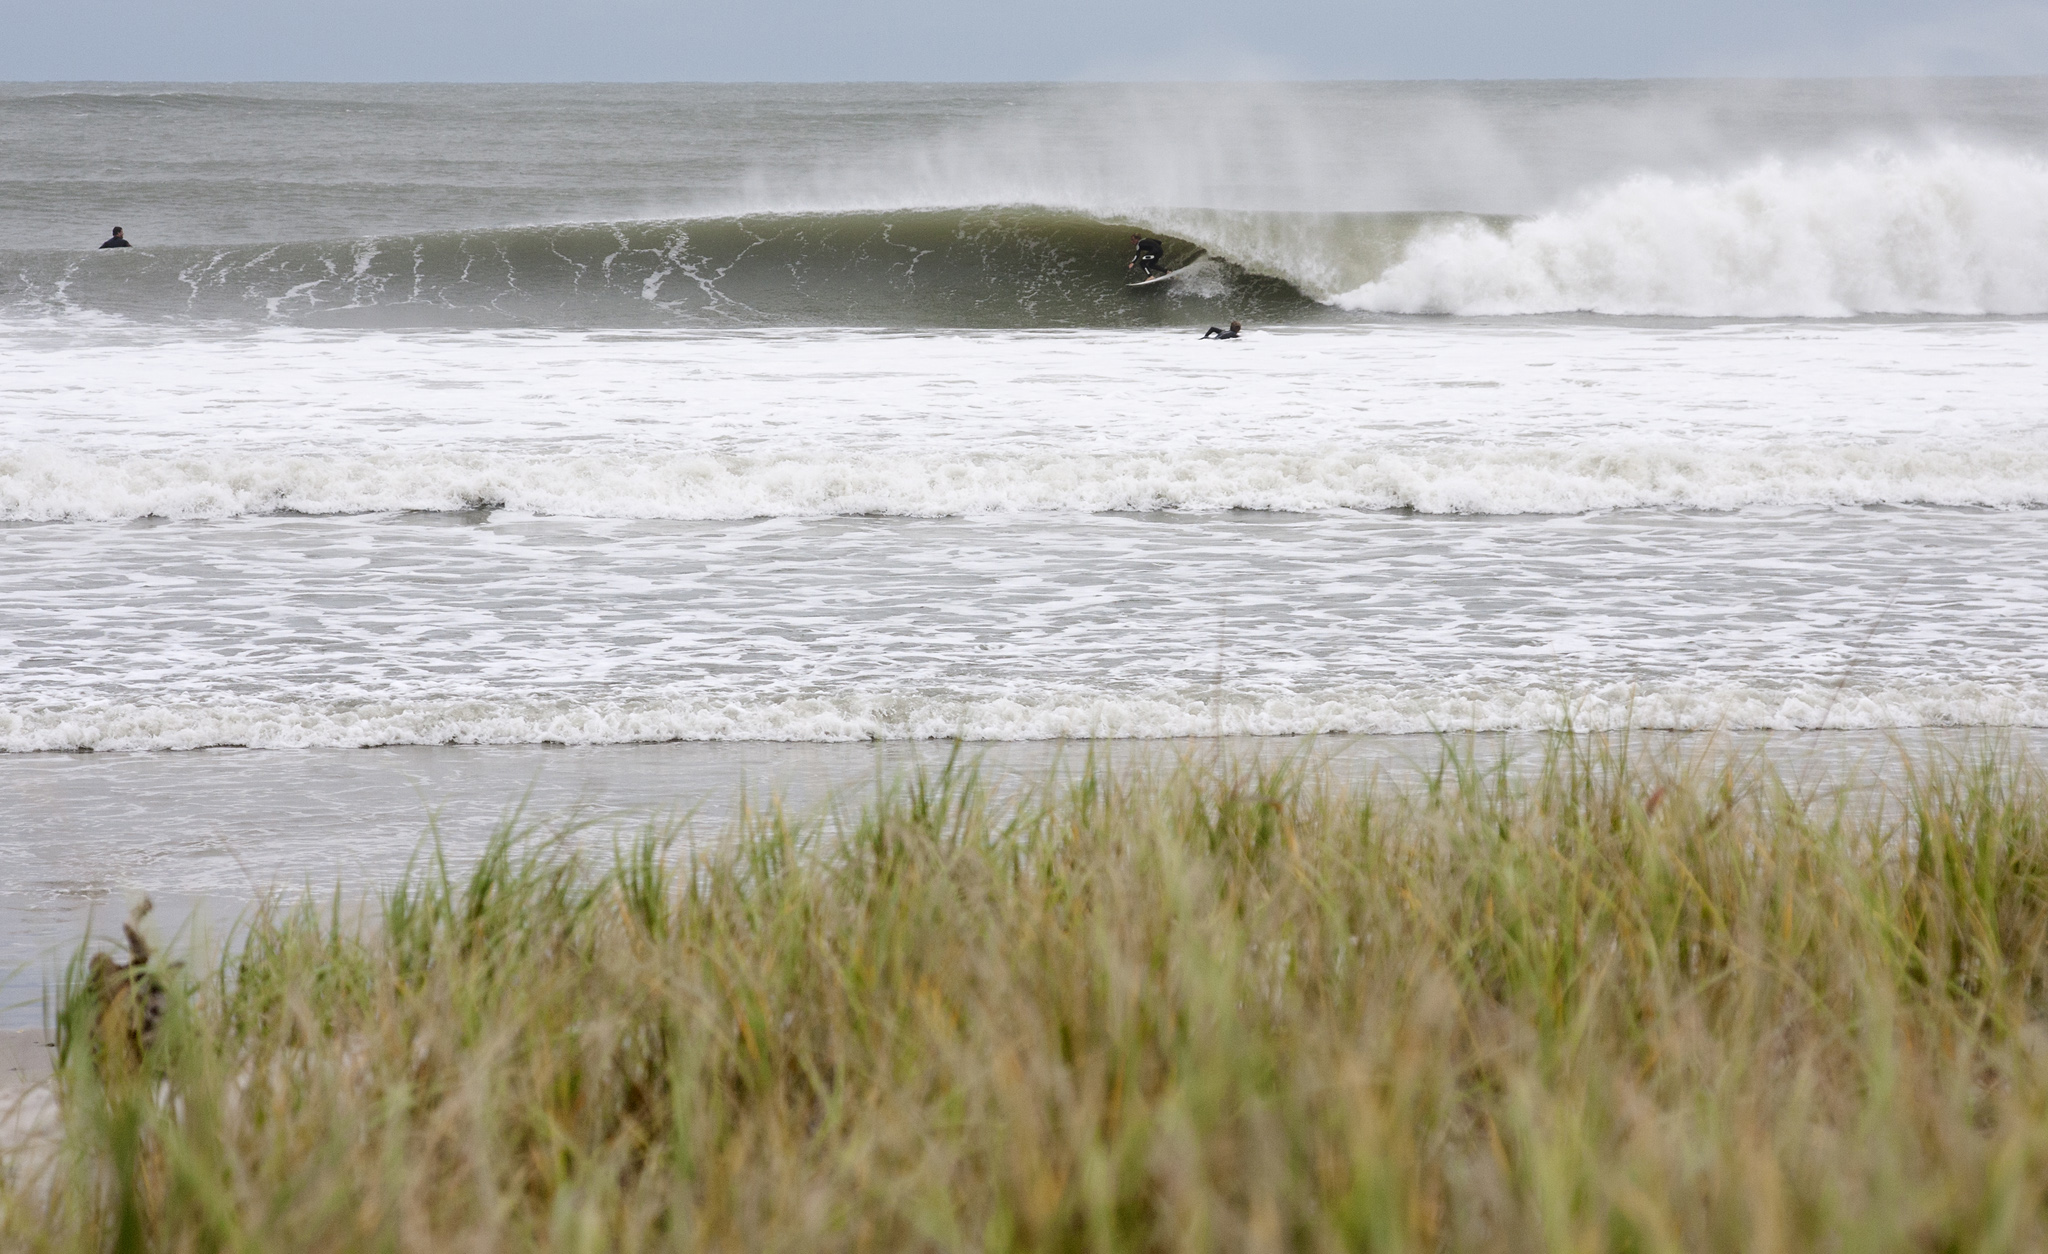 /photo/2012/1031/as_surf_sandy4_2048.jpg